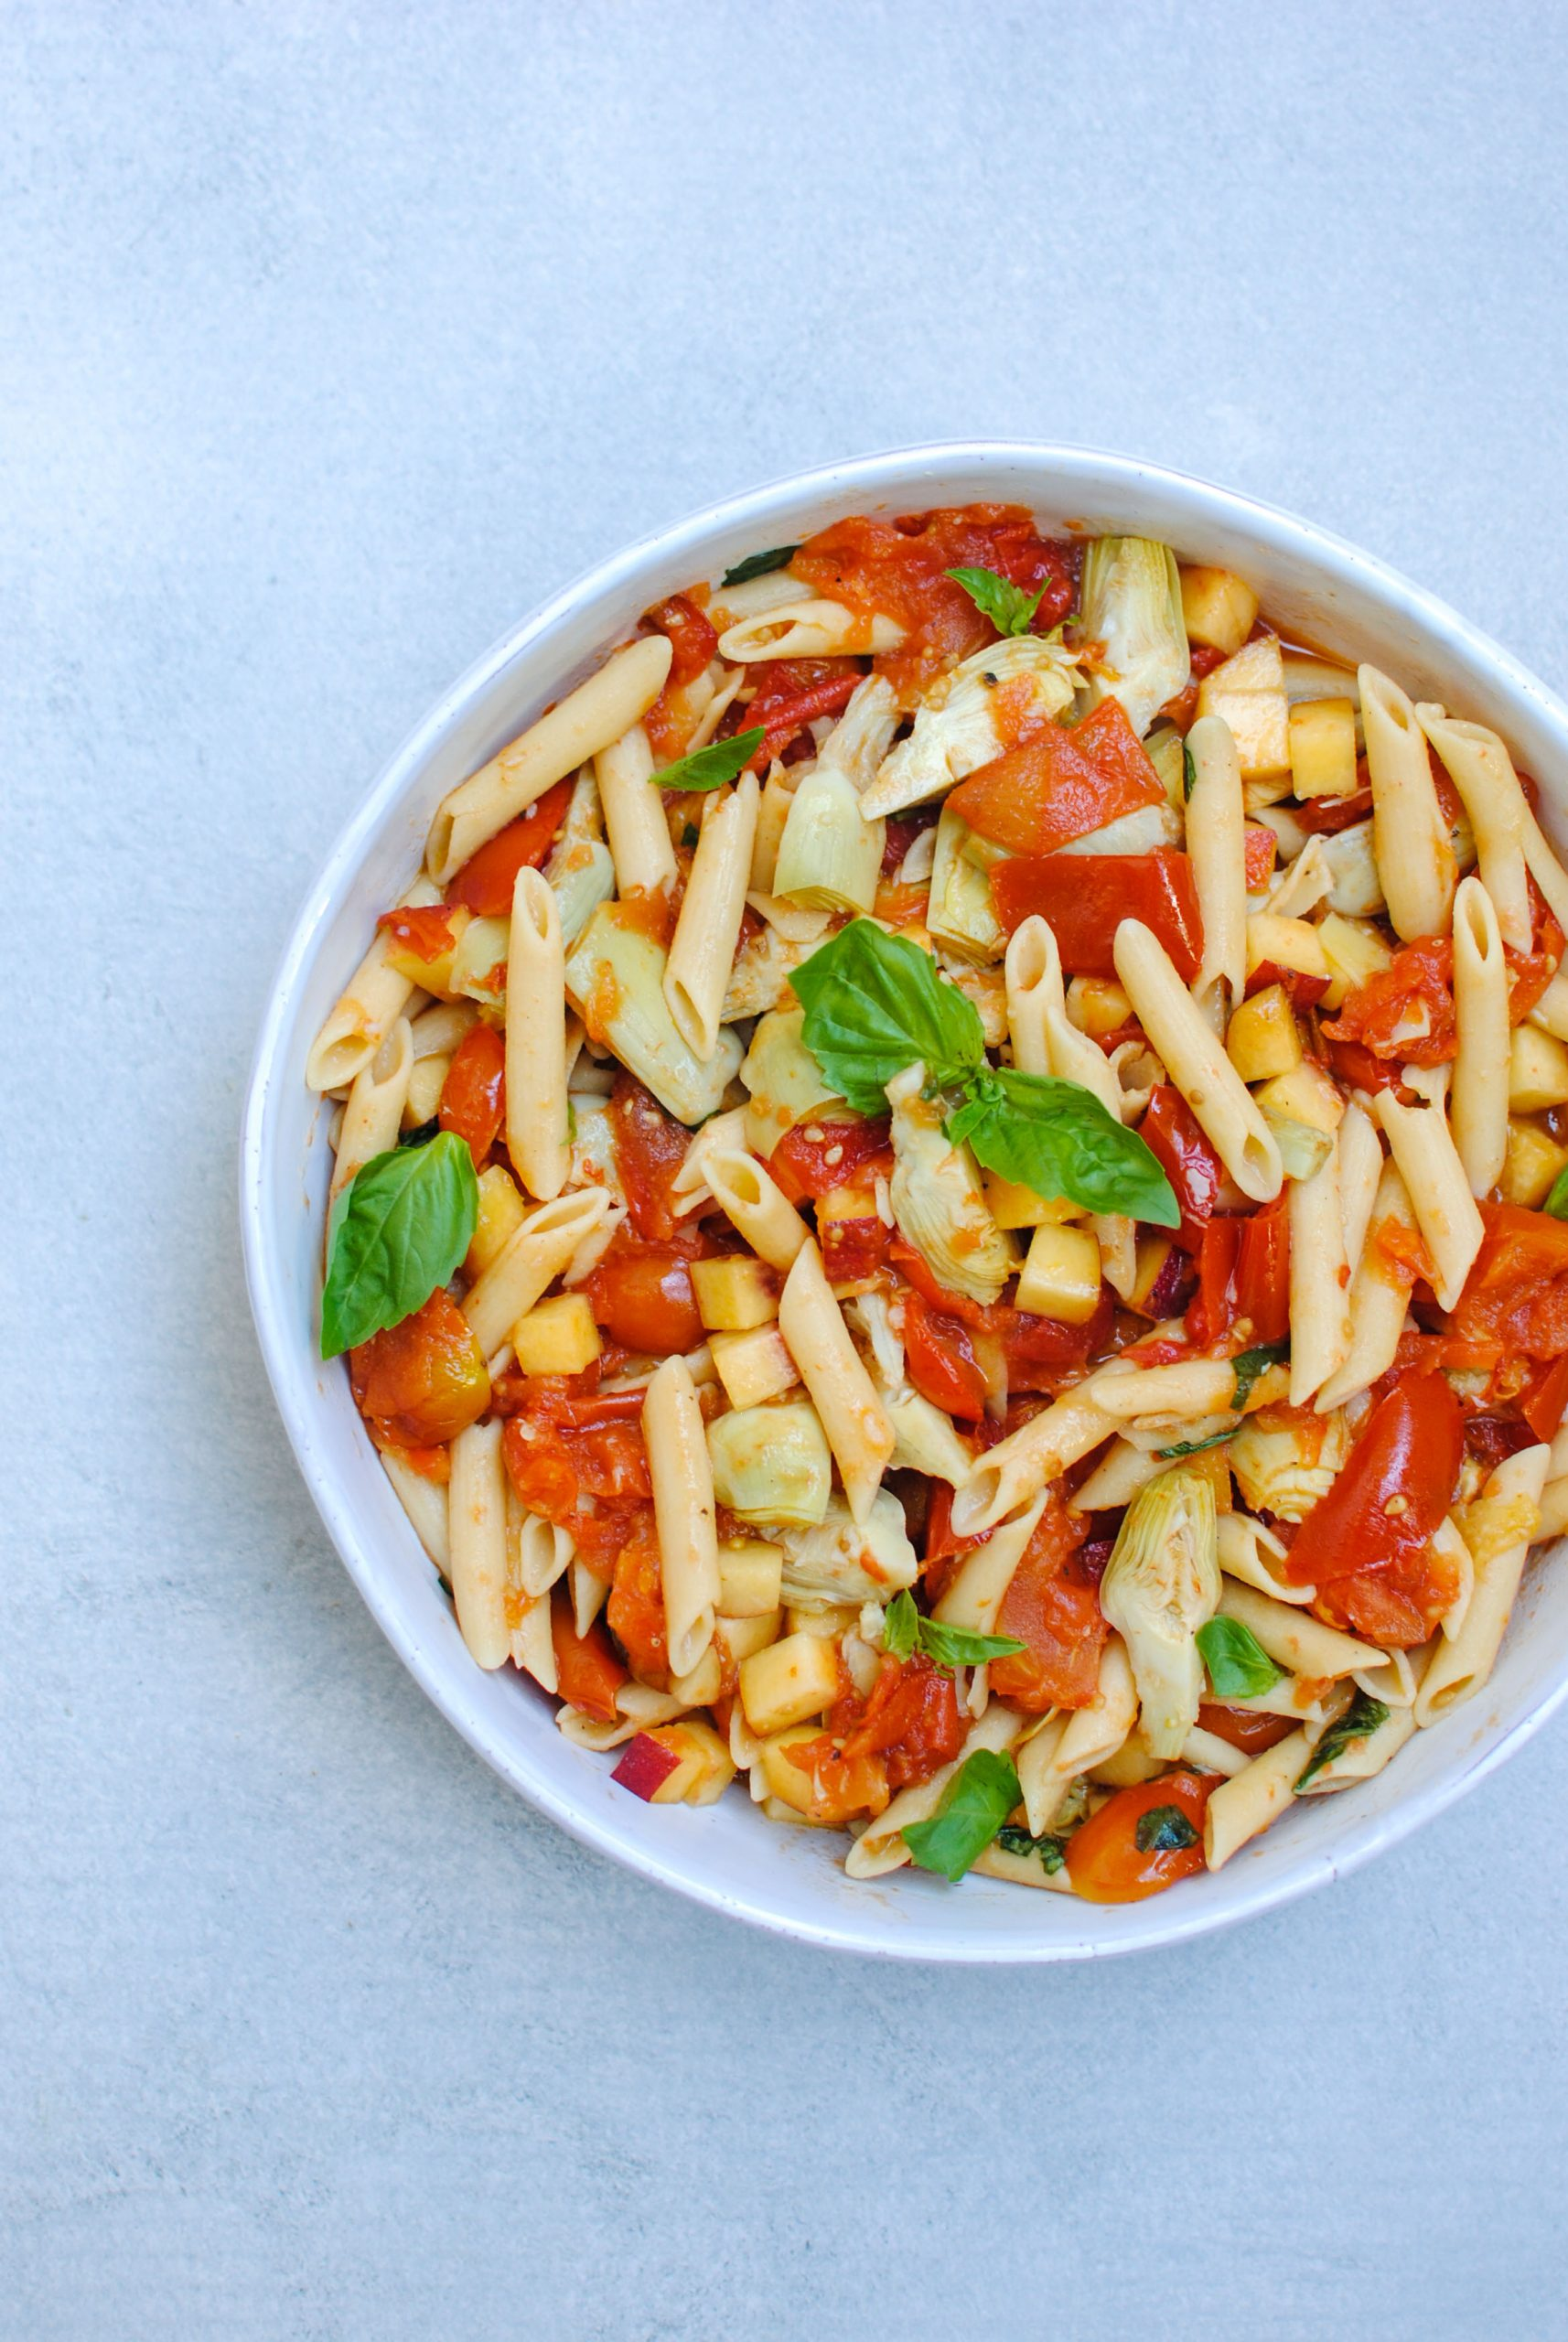 roast tomato chickpea pasta | please consider | joana limao